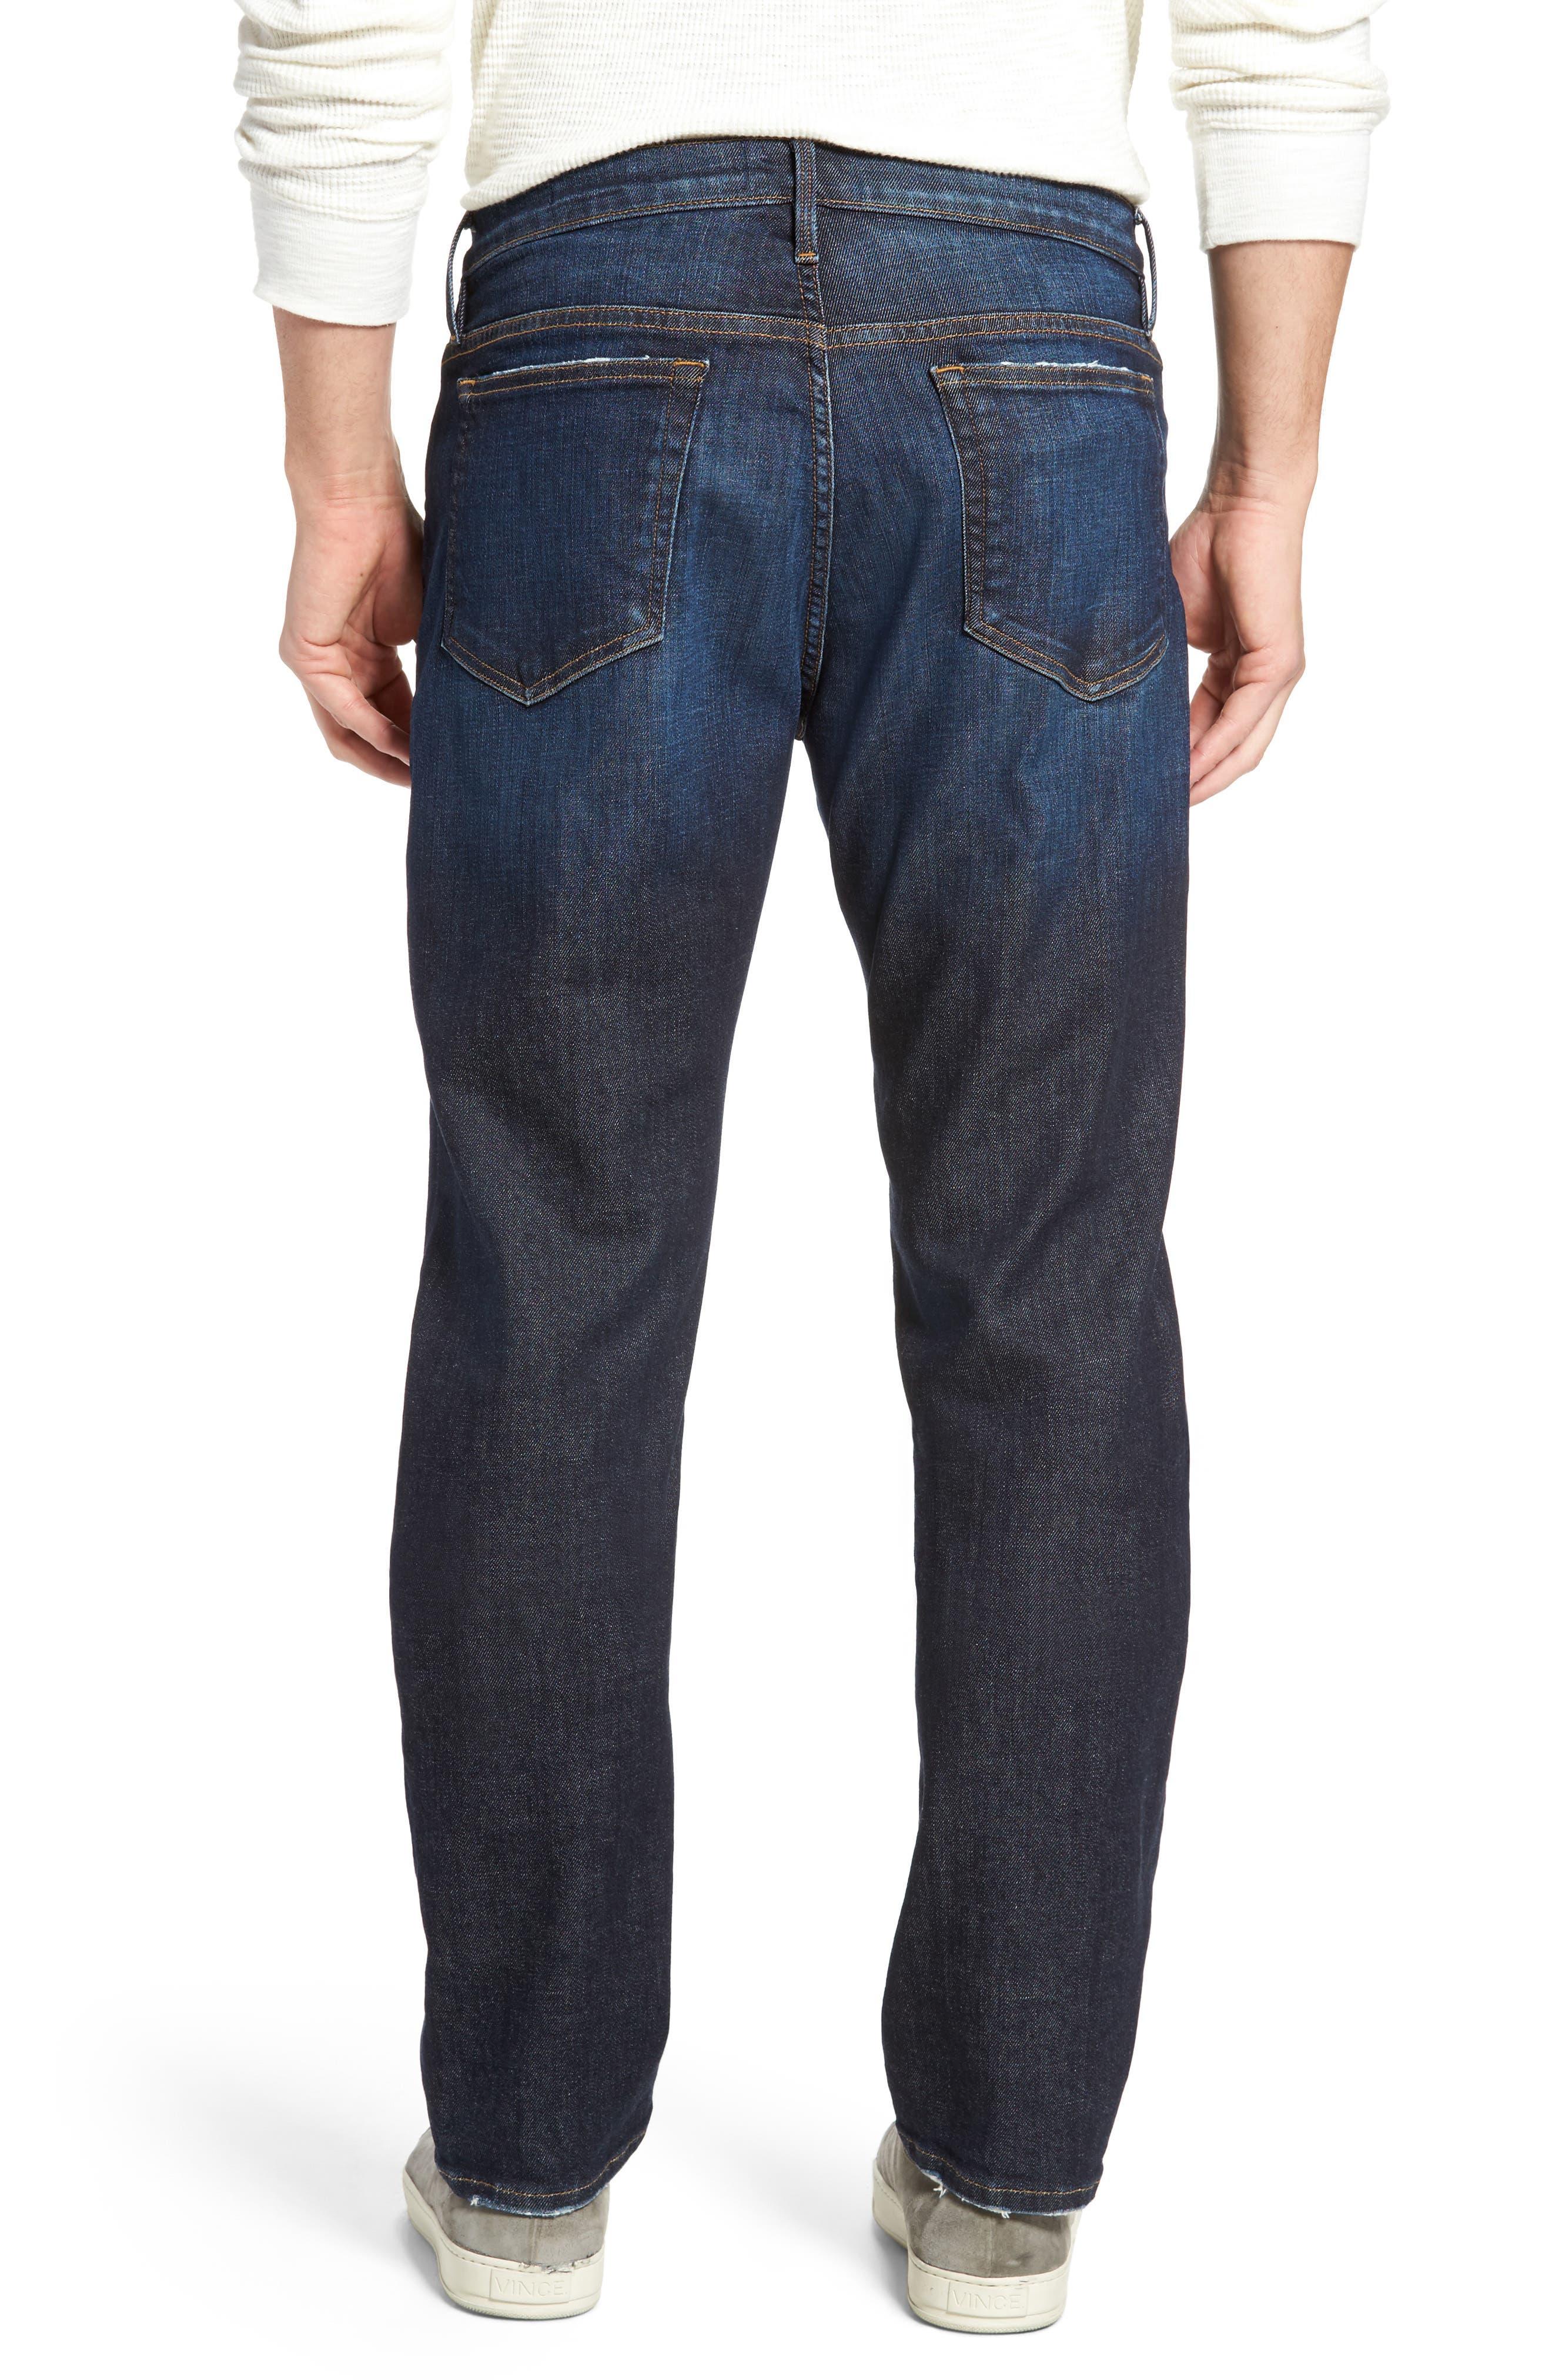 L'Homme Slim Straight Leg Jeans,                             Alternate thumbnail 2, color,                             401